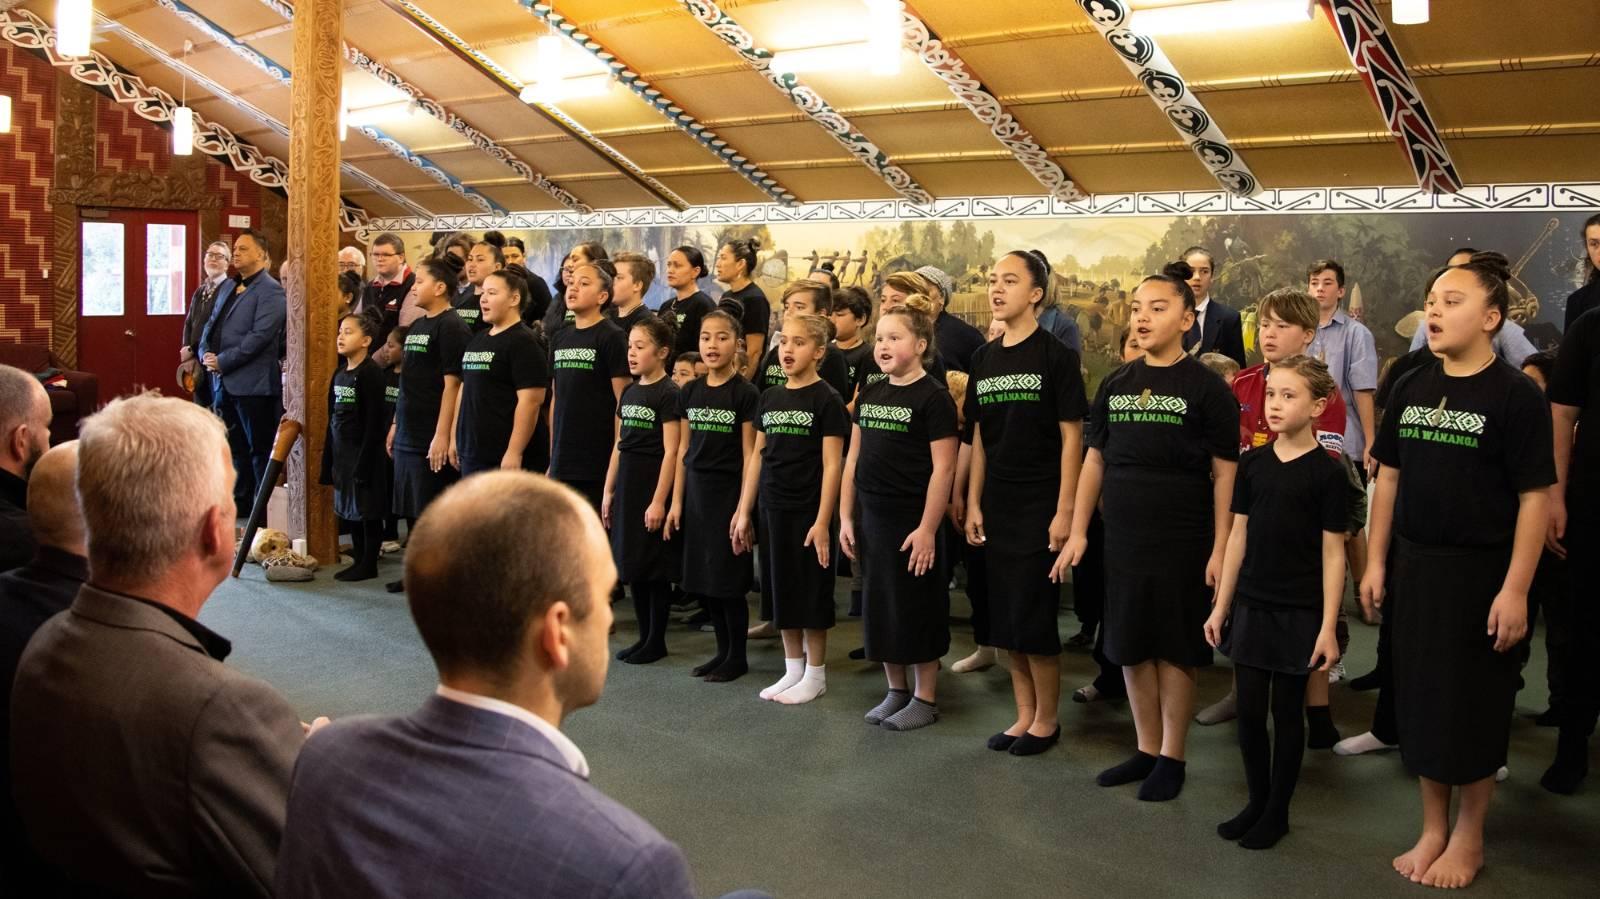 Te Tātoru o Wairau: Iwi gift name to school relocation project